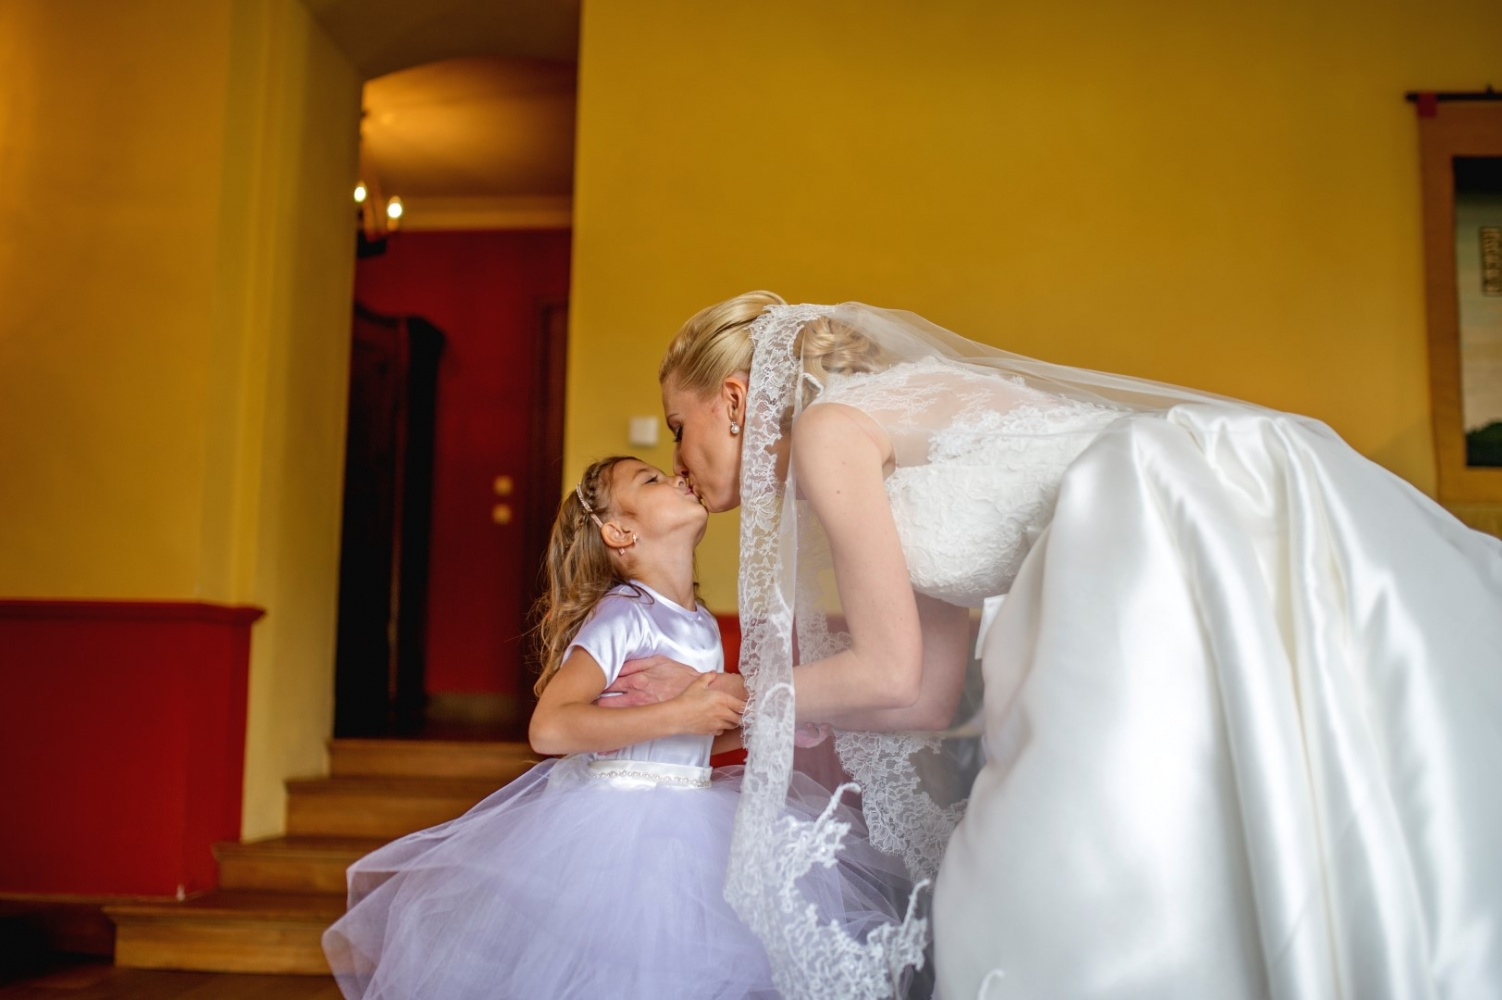 http://www.fotoz.sk/images/gallery-26/normal/svadba_hotel-chateau-bela_037.jpg